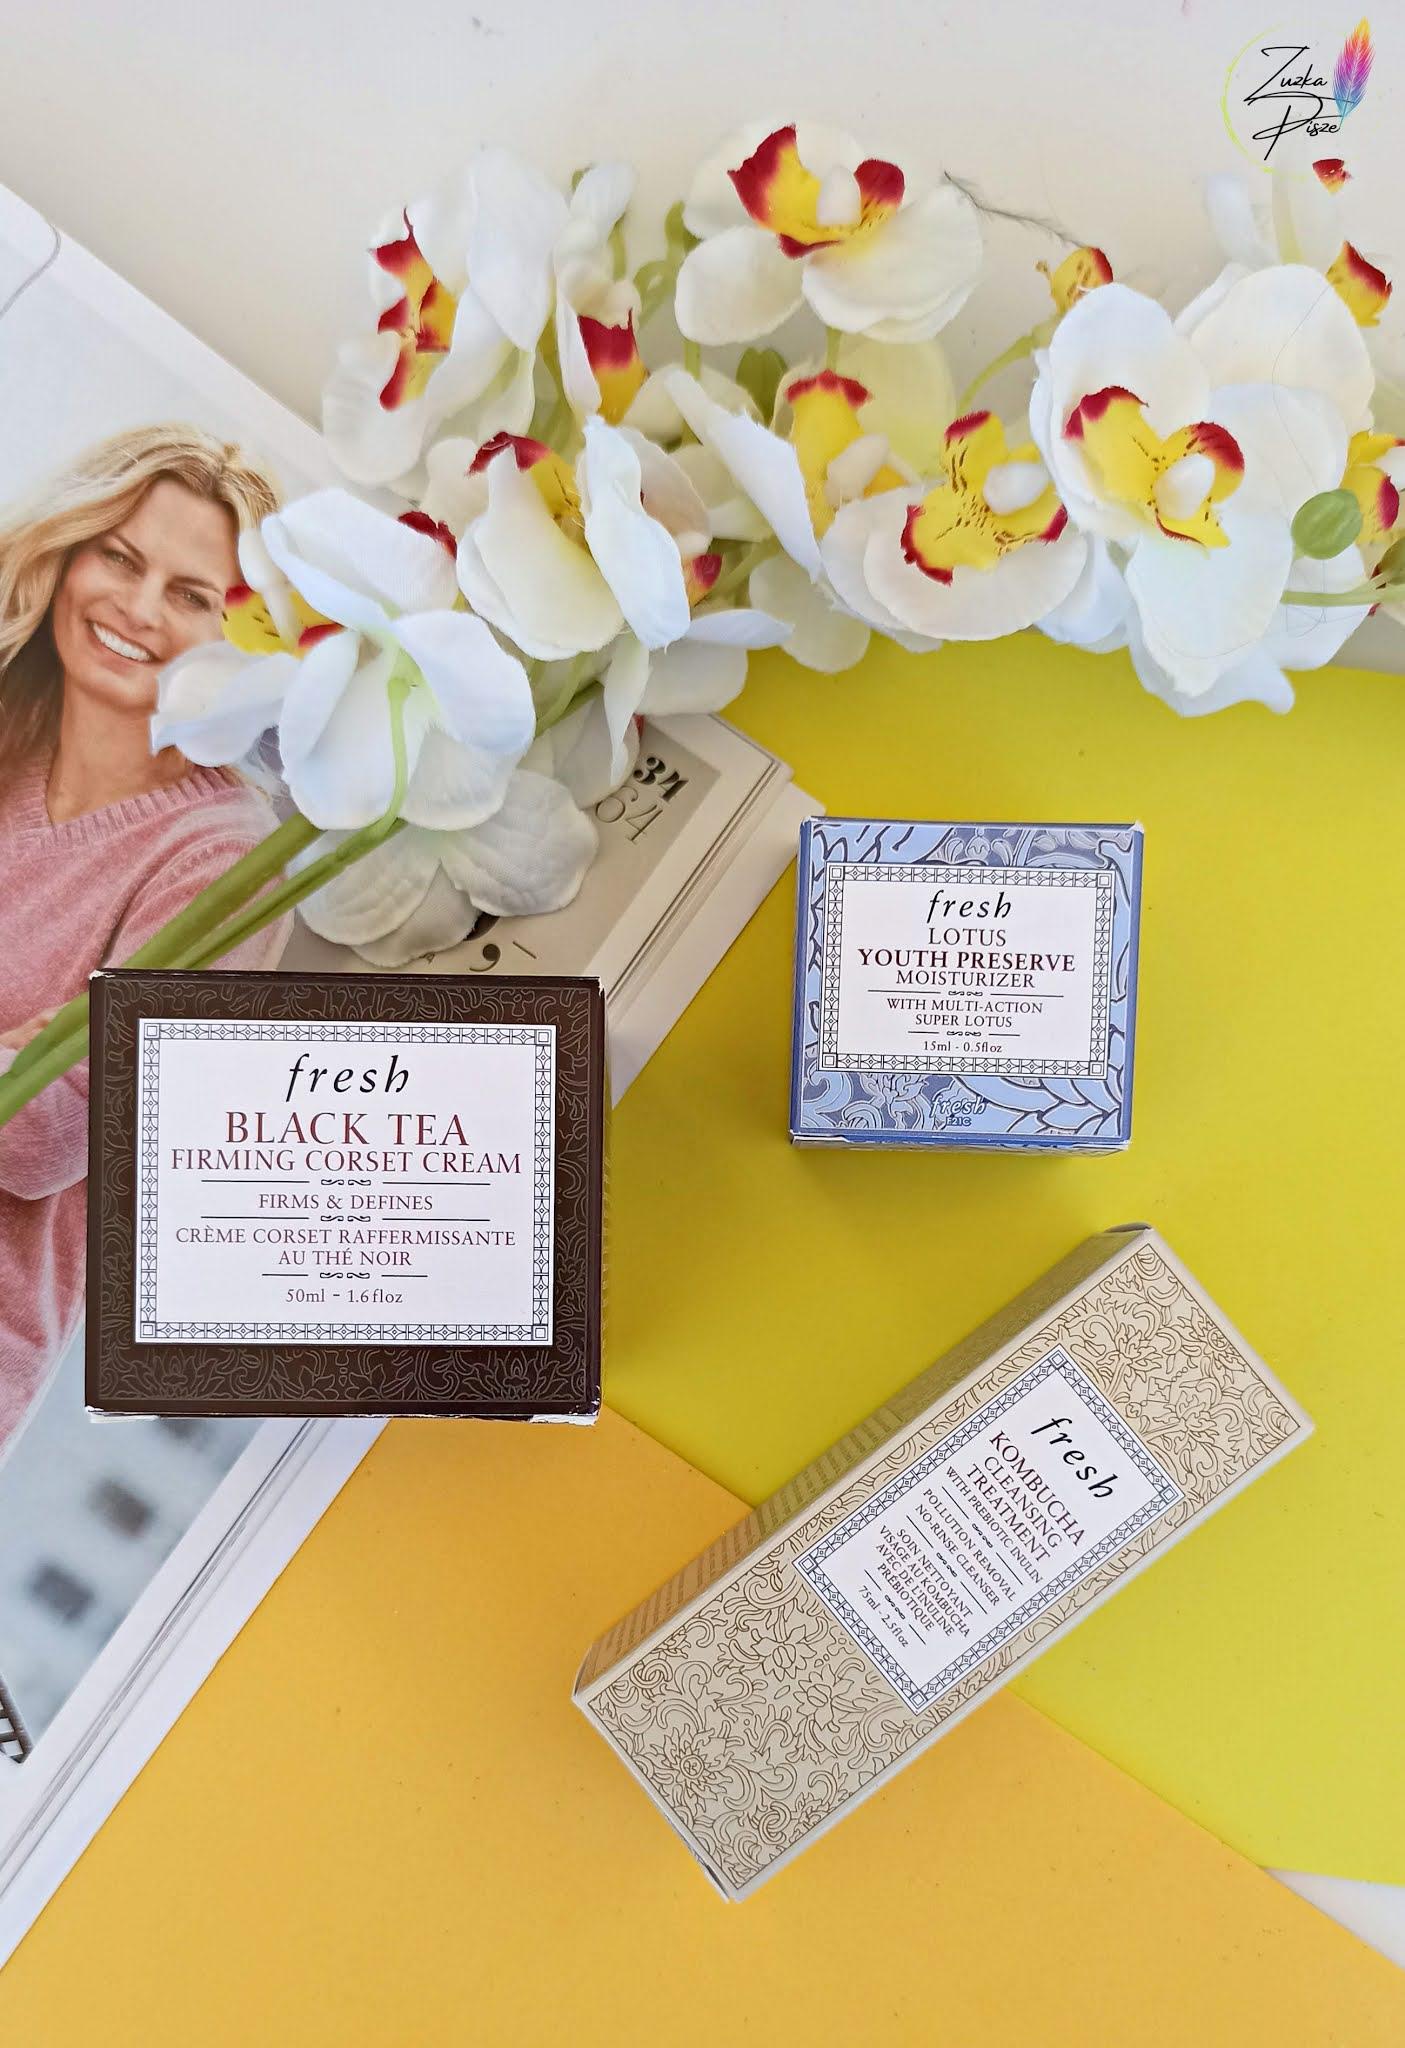 Pielęgnacja twarzy z marką FRESH -  Kombucha Cleansing Treatment, Lotus Youth Preserve Face Cream & Black Tea Firming Corset Cream